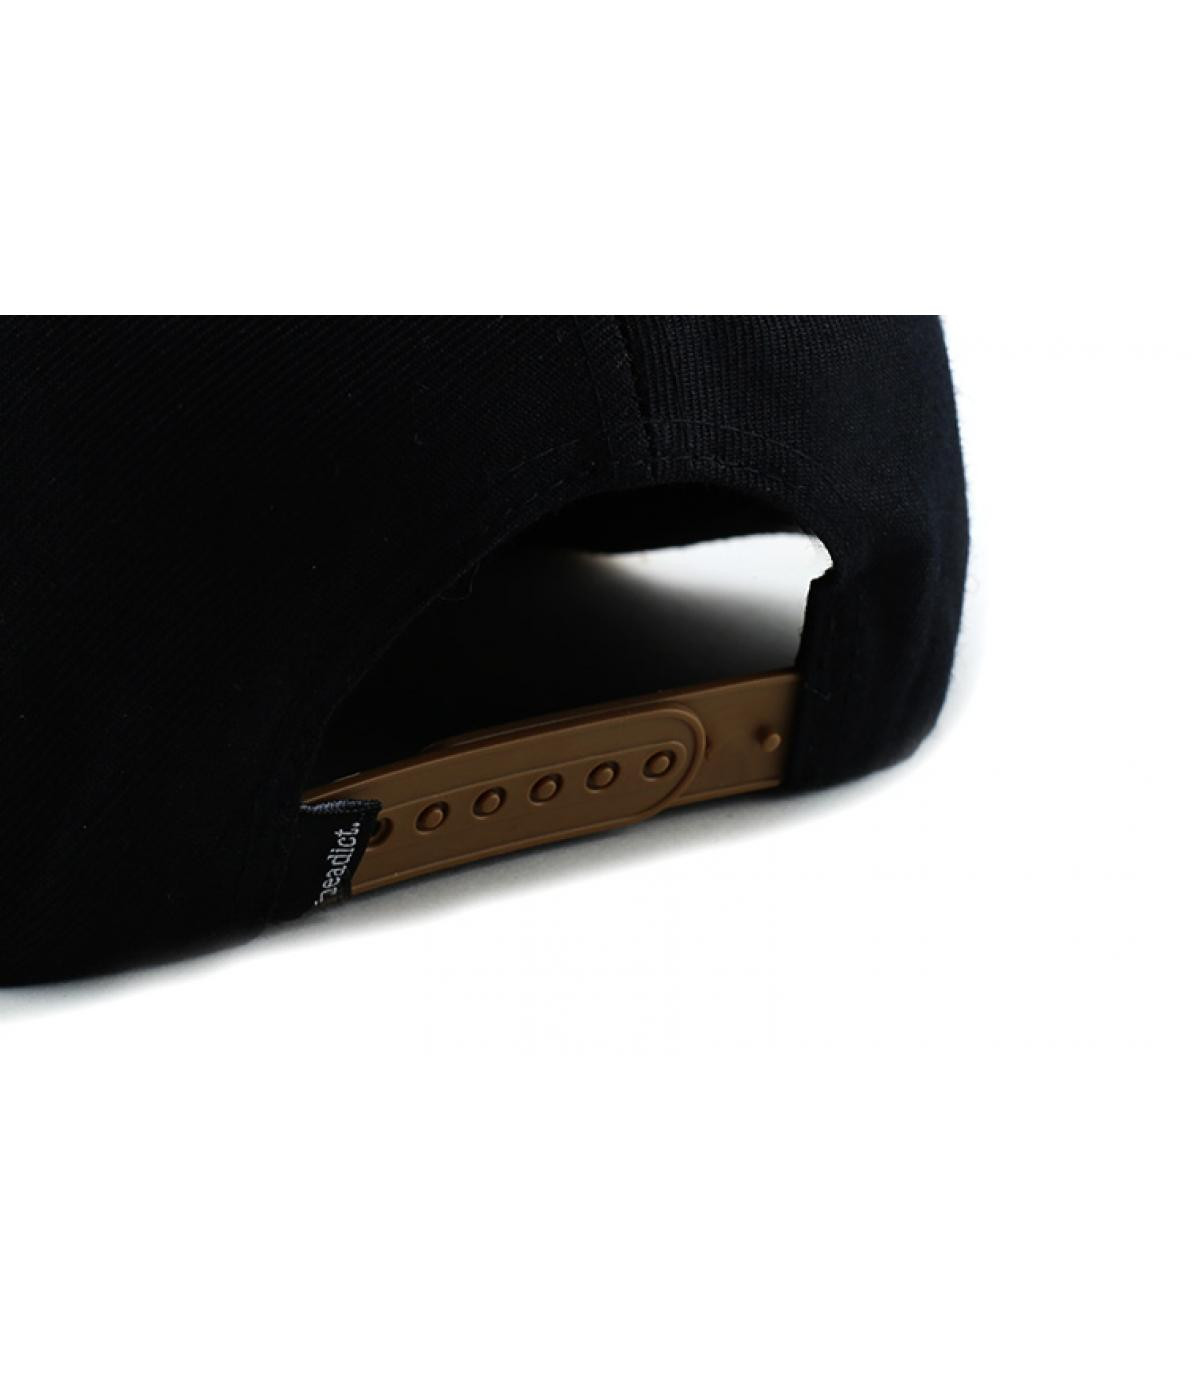 Dettagli Snapback Pillow Line black brown - image 5